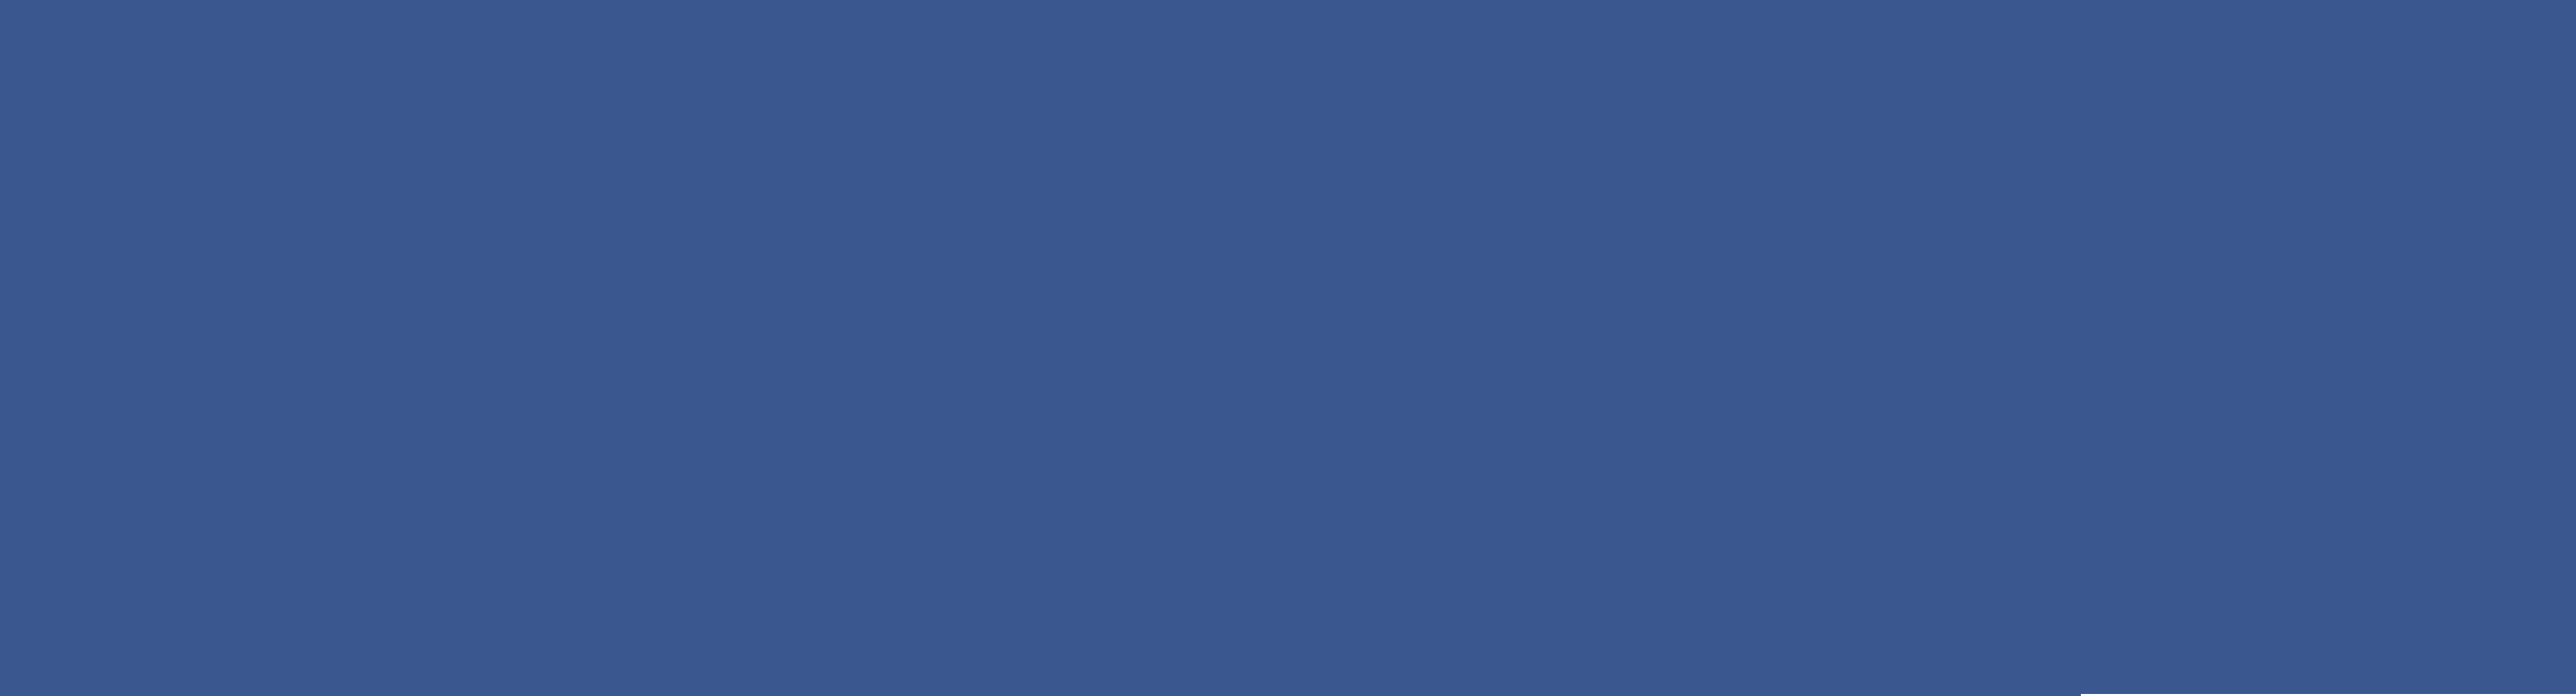 Specialty Dental Brands